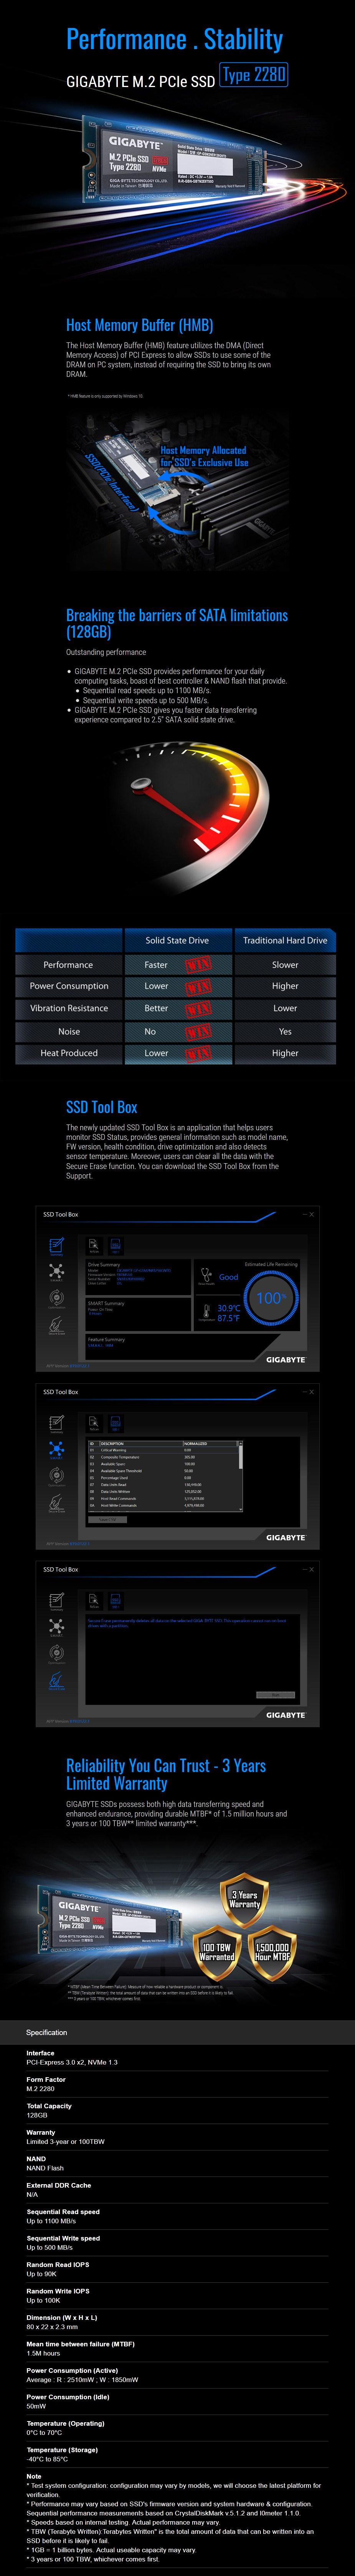 Gigabyte 128GB M.2 NVMe SSD GP-GSM2NE8128GNTD - Overview 1